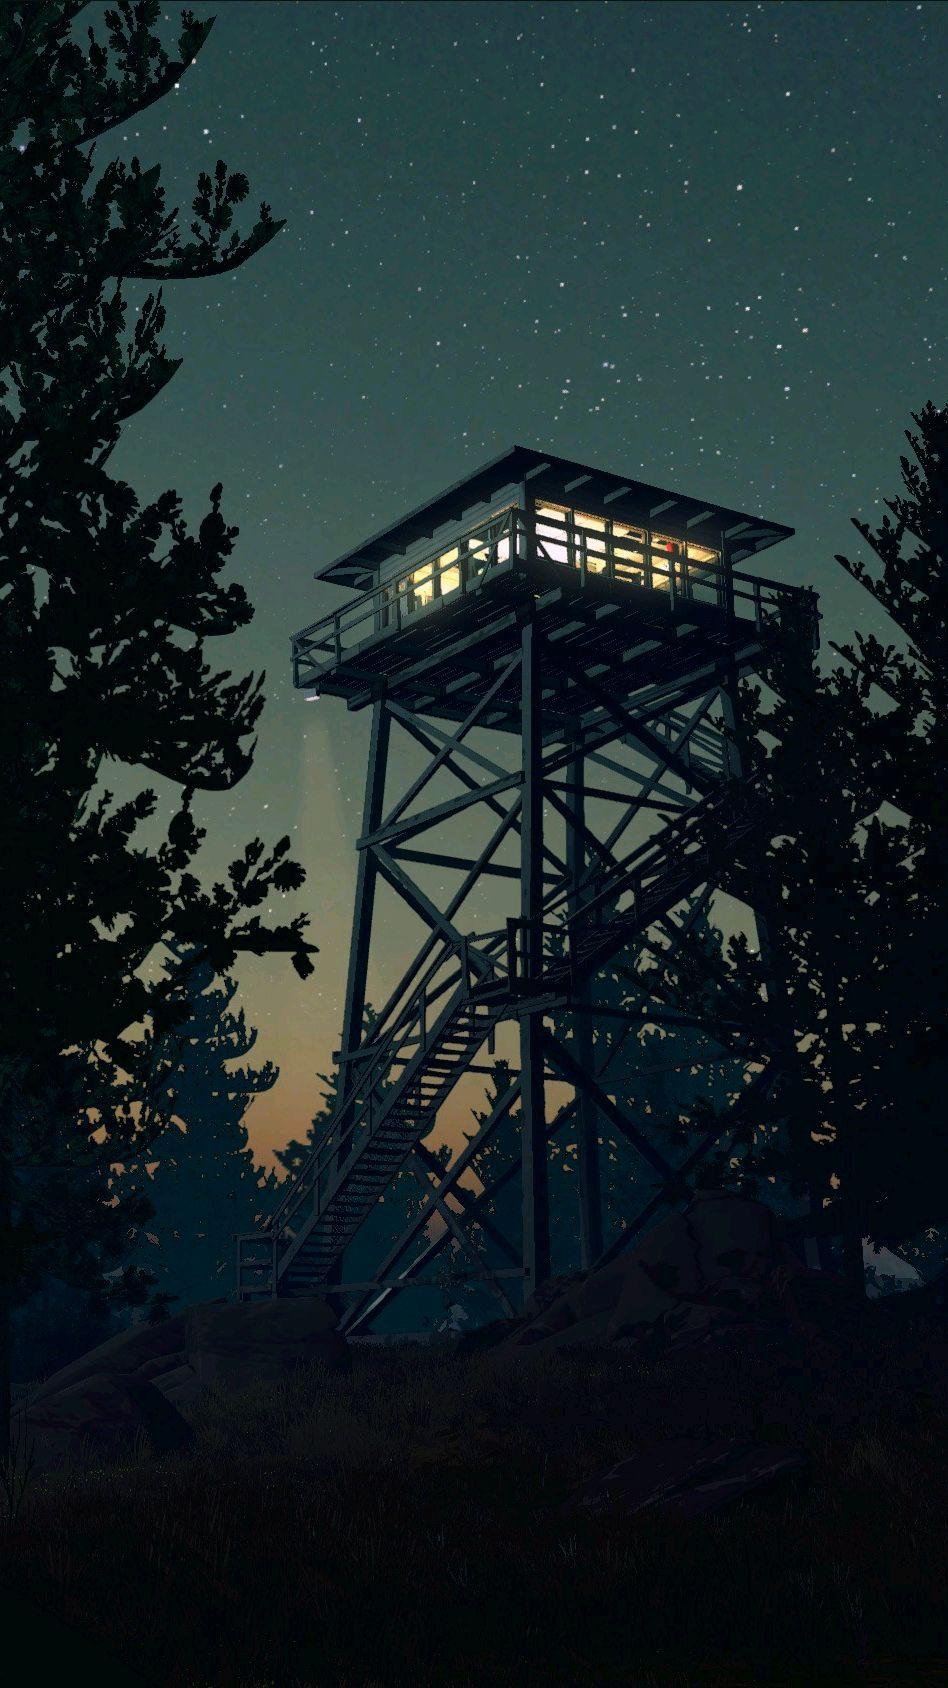 Firewatch Game Minimal Tower Night iPhone Wallpaper iphoneswallpapers com